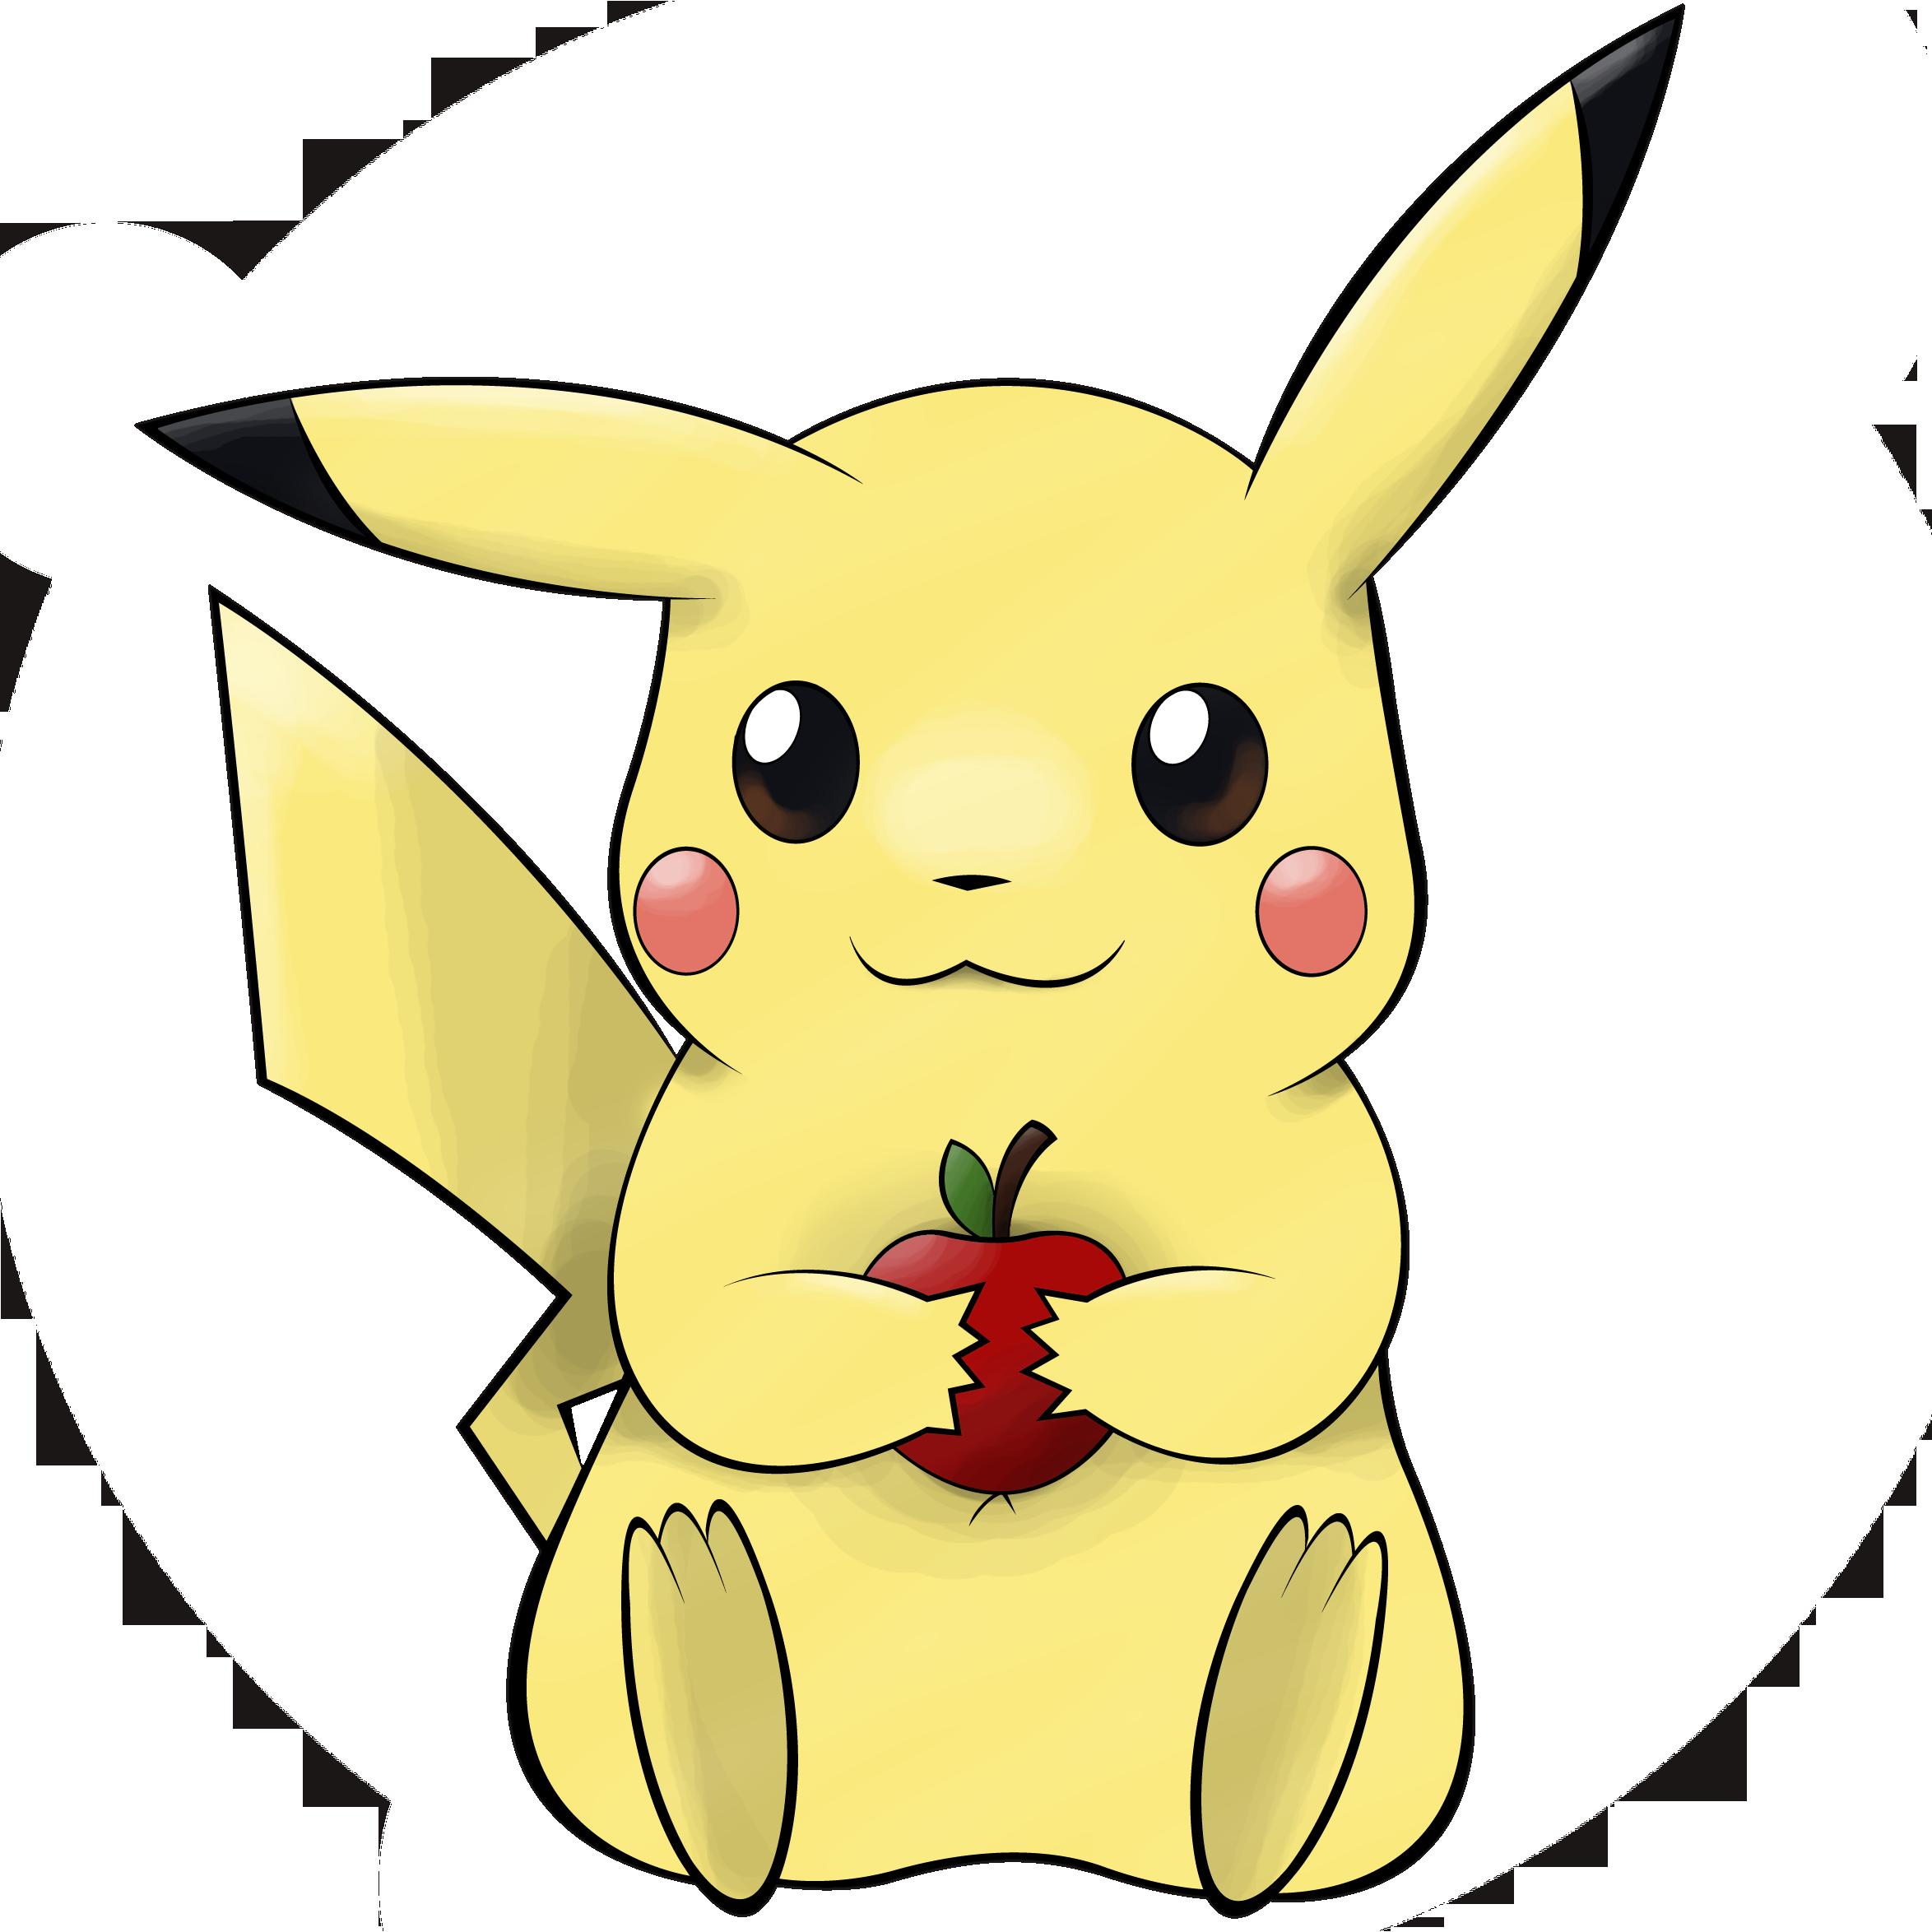 2348x2348 025 Pikachu By Mondecolore On DeviantArt